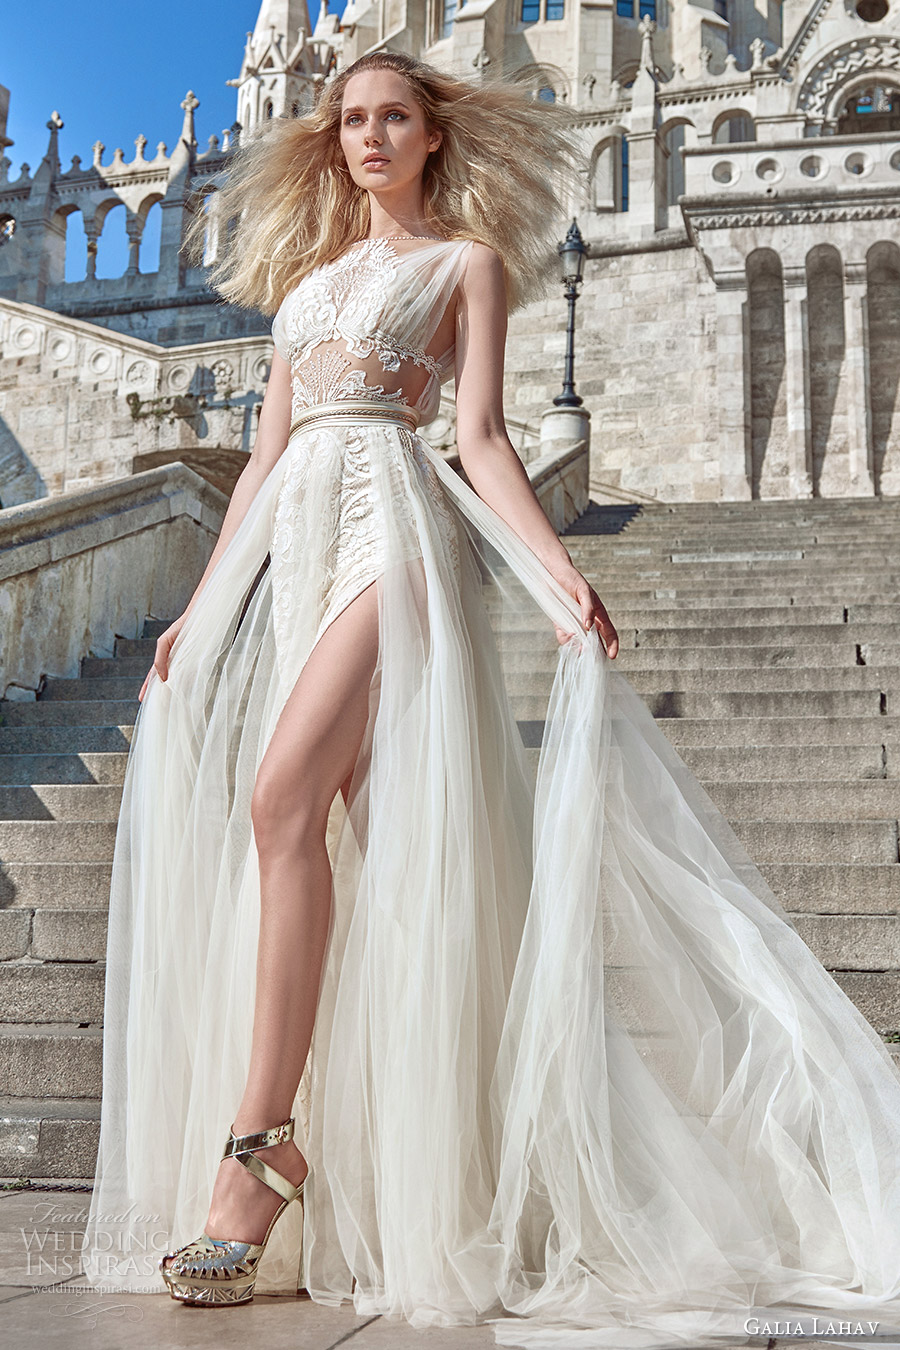 Victorian Gothic Wedding Dresses 97 Unique galia lahav fall bridal